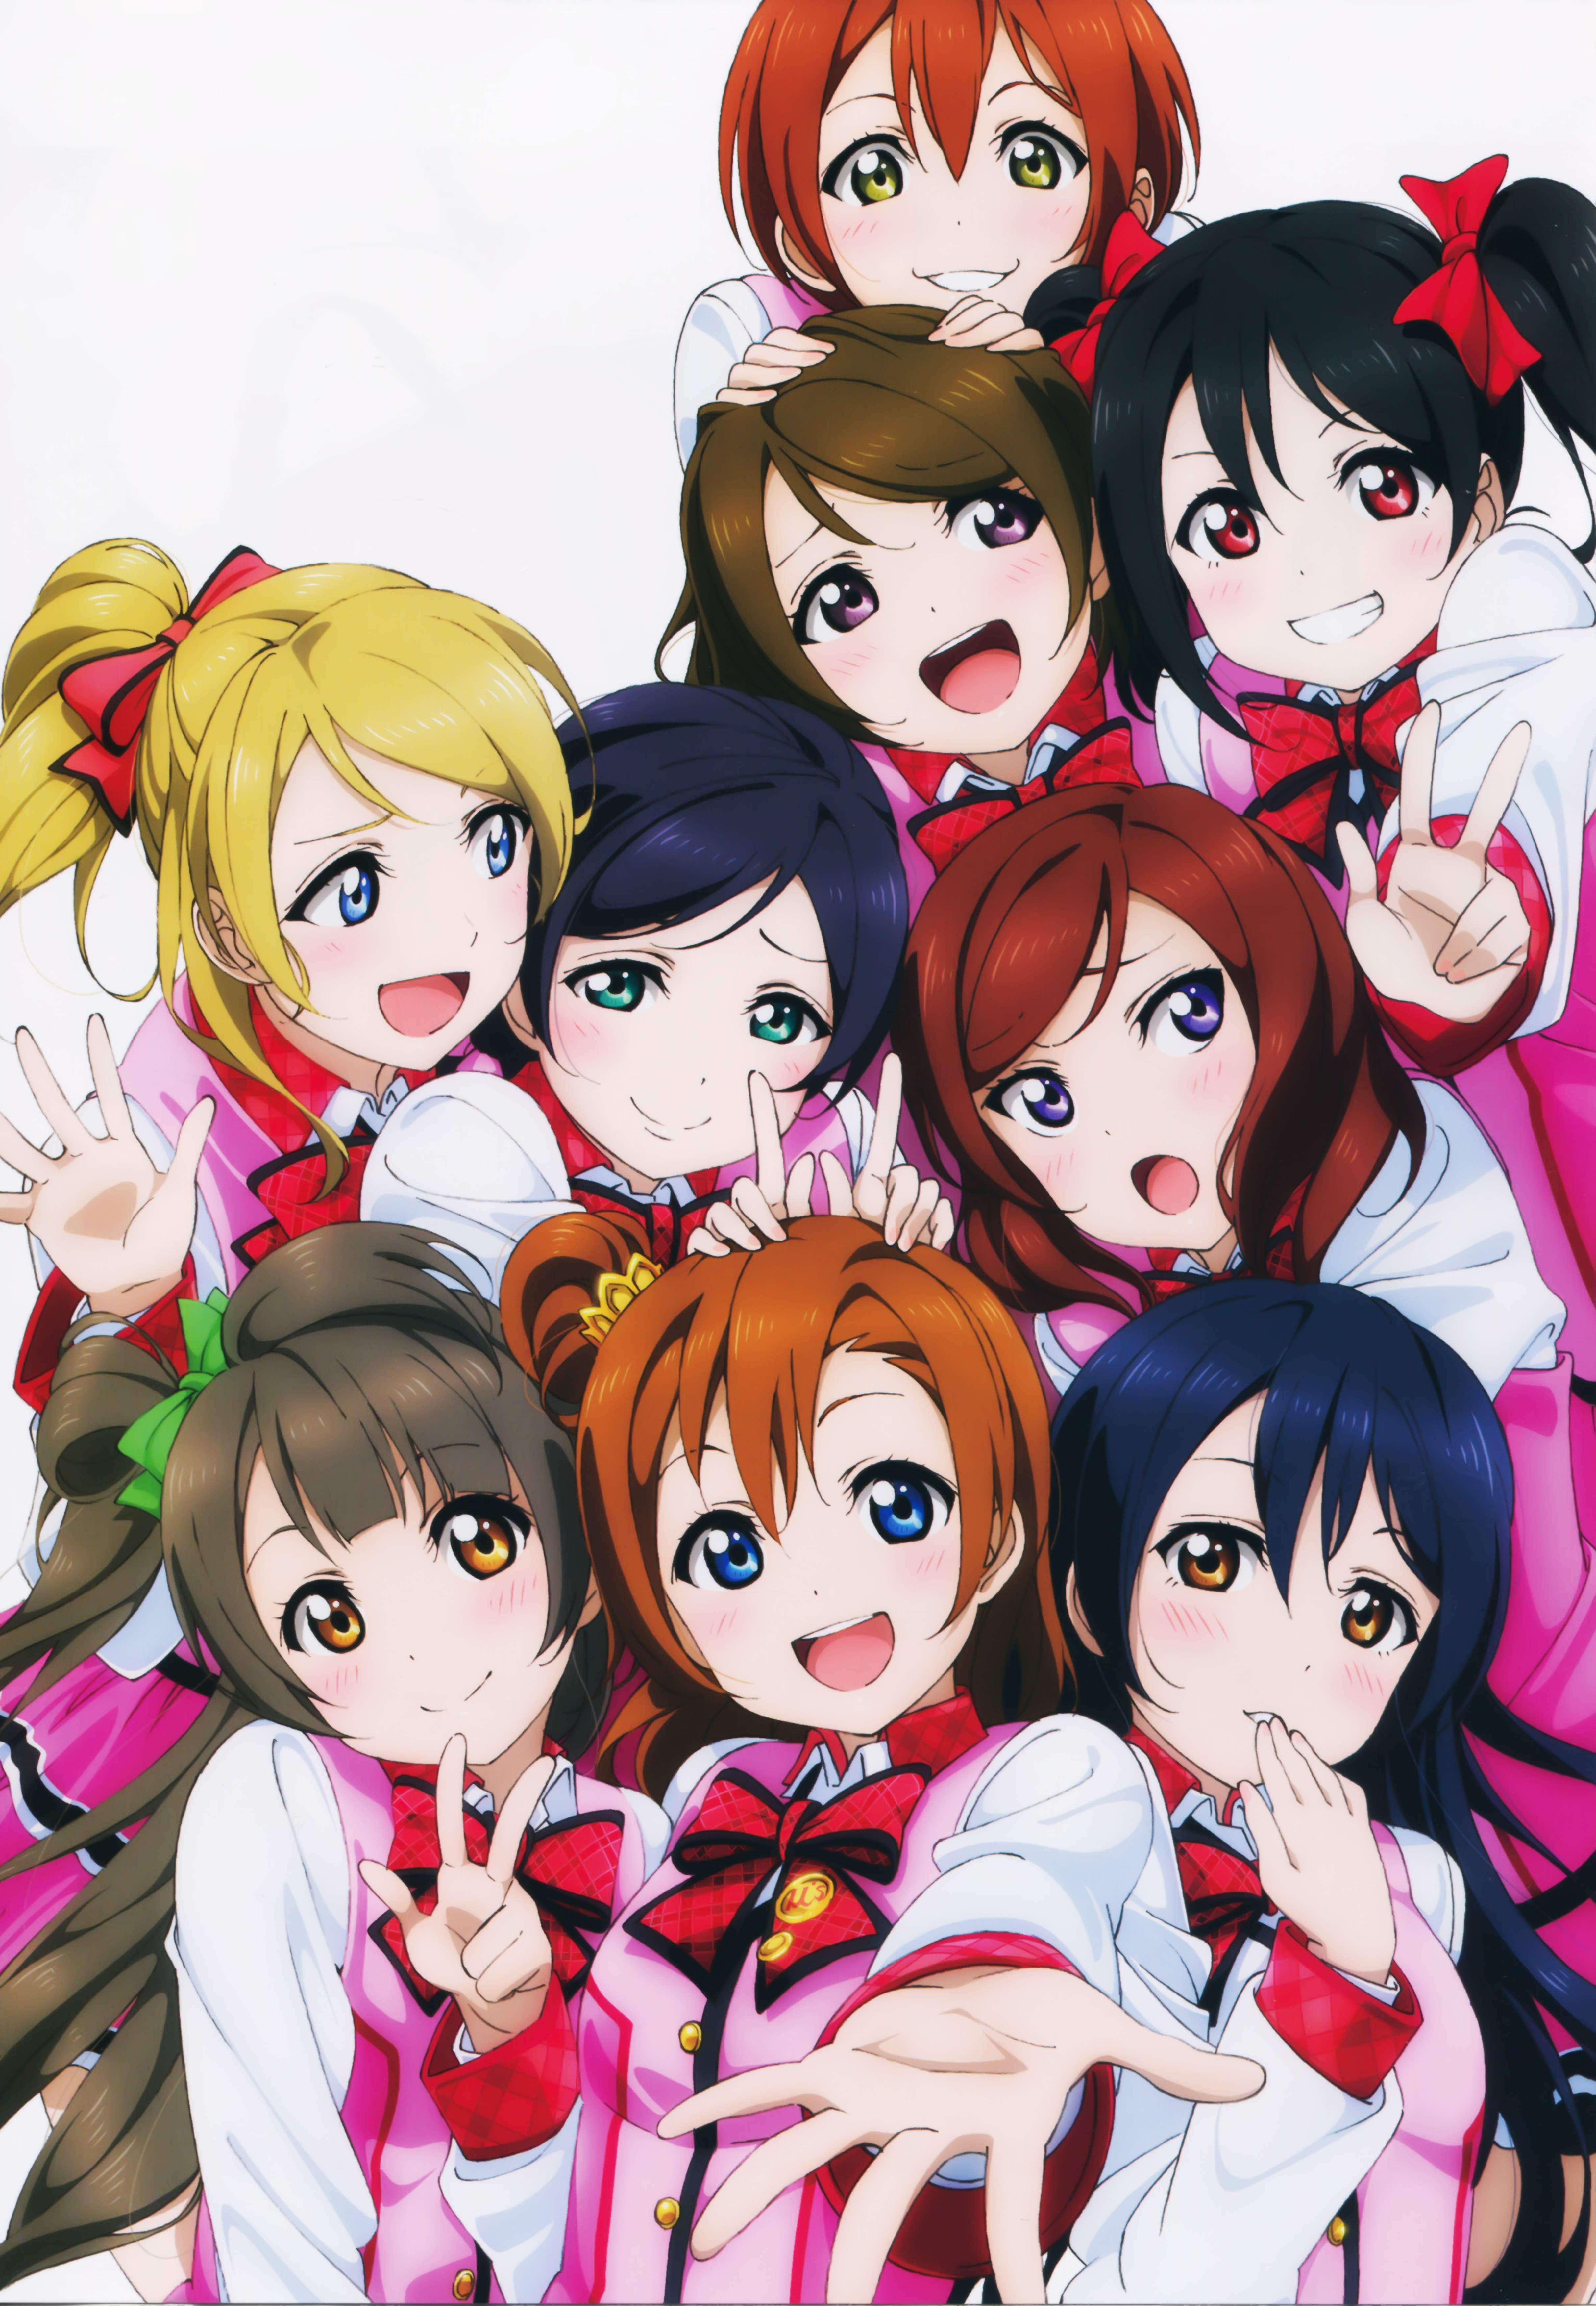 M S Love Live Mobile Wallpaper 1769076 Zerochan Anime Image